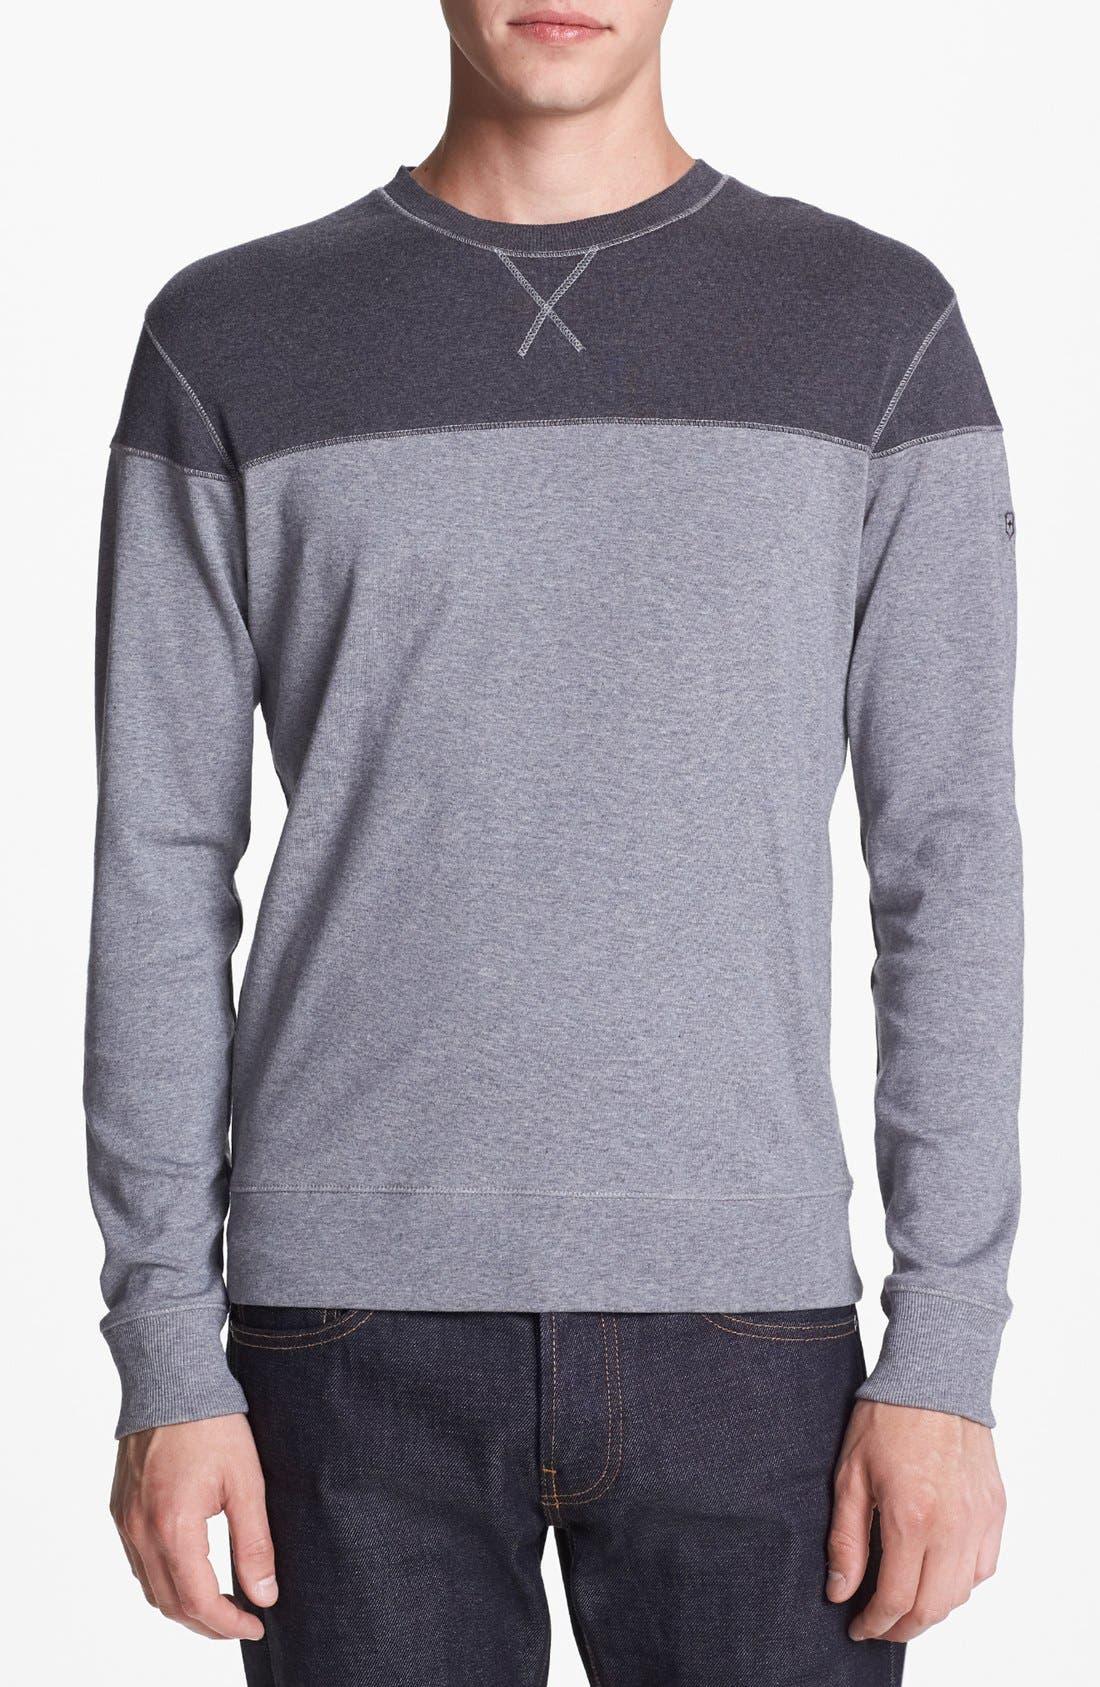 VICTORINOX SWISS ARMY<SUP>®</SUP> Long Sleeve T-Shirt, Main, color, 065